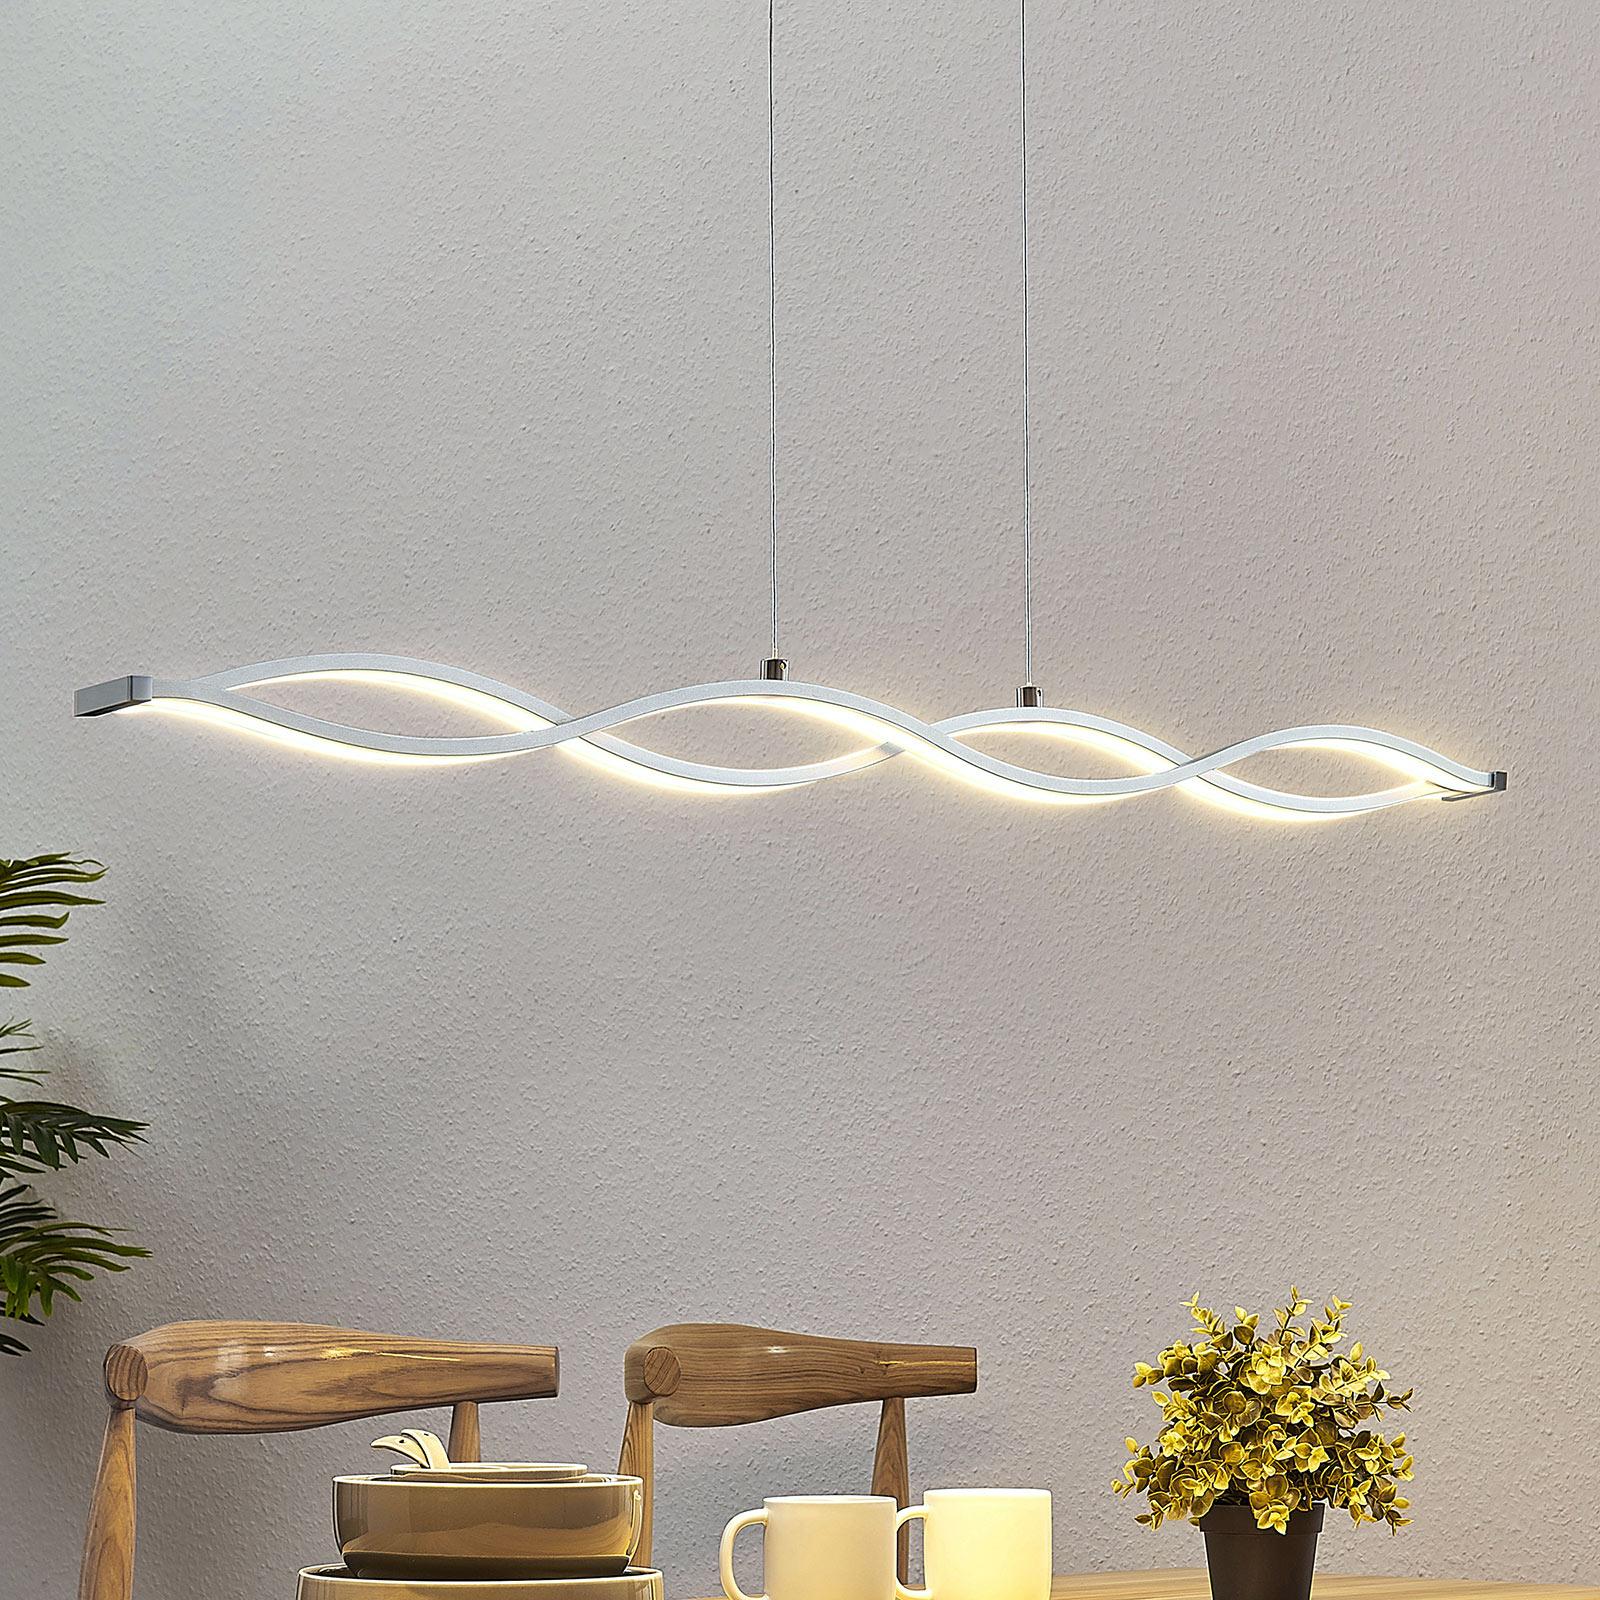 Lampada a sospensione LED Roan, ondulata